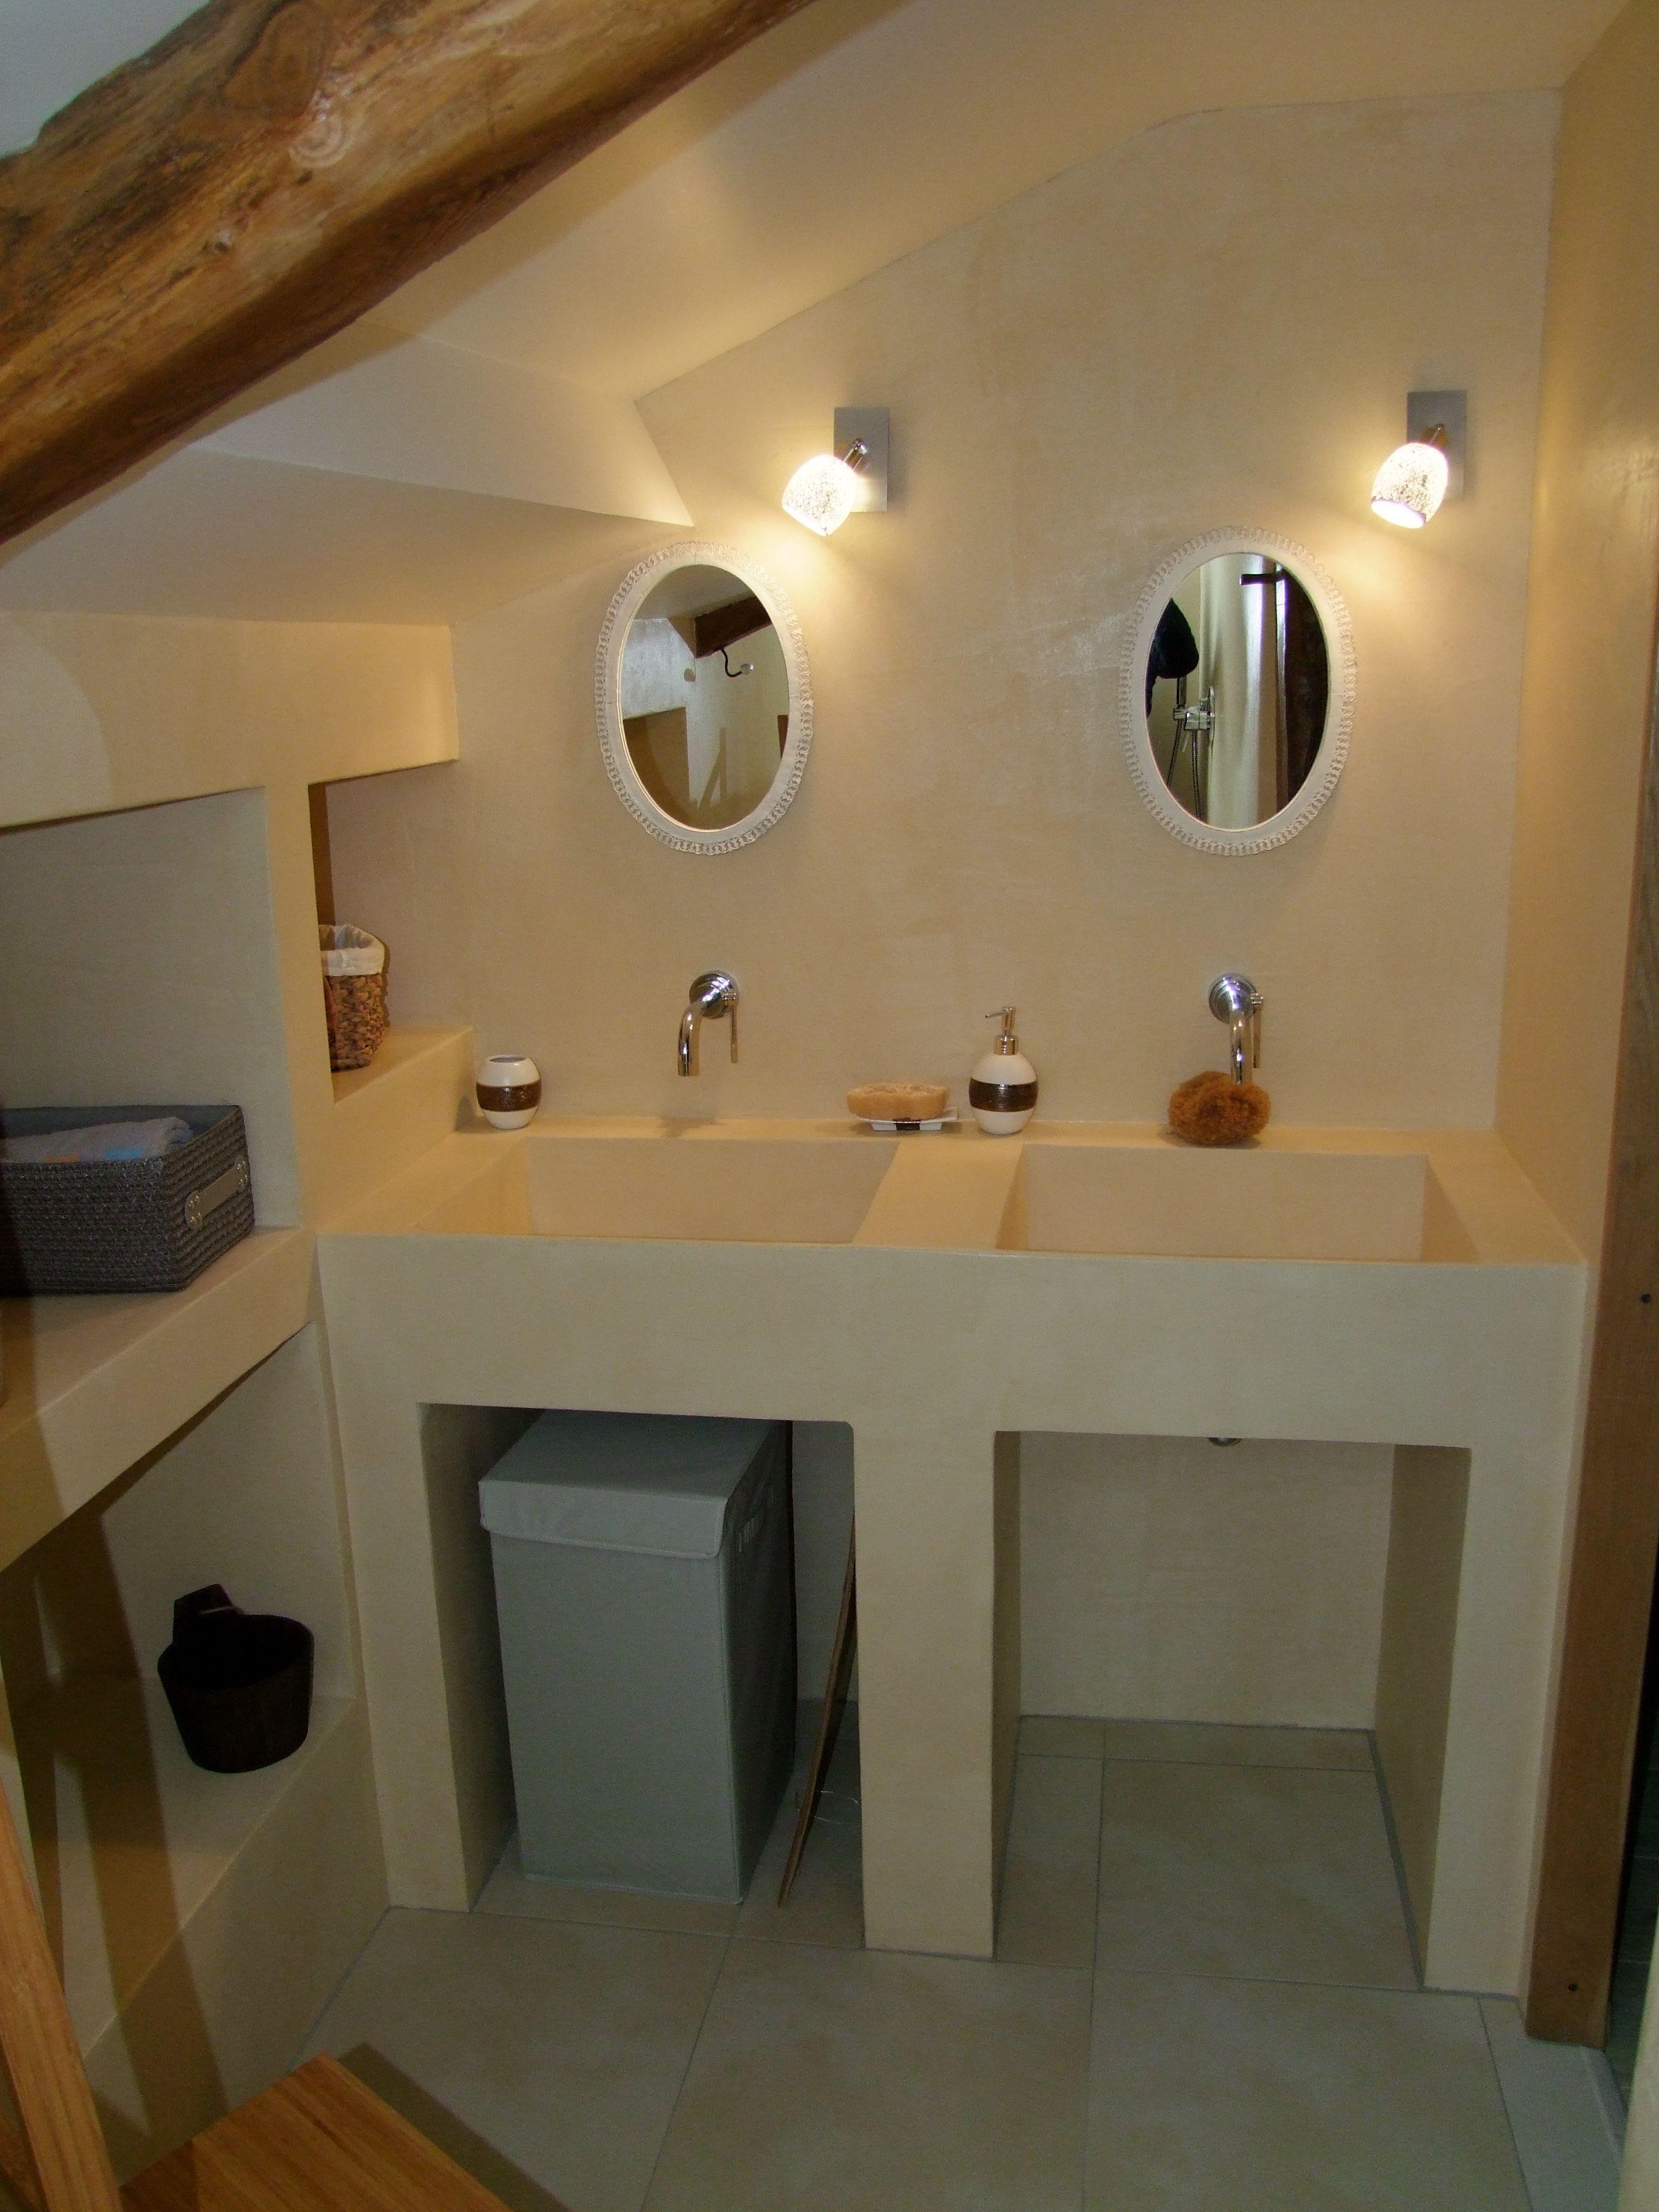 Rev tement pour douche et salle de bains en b ton cir - Beton cire pour carrelage salle de bain ...